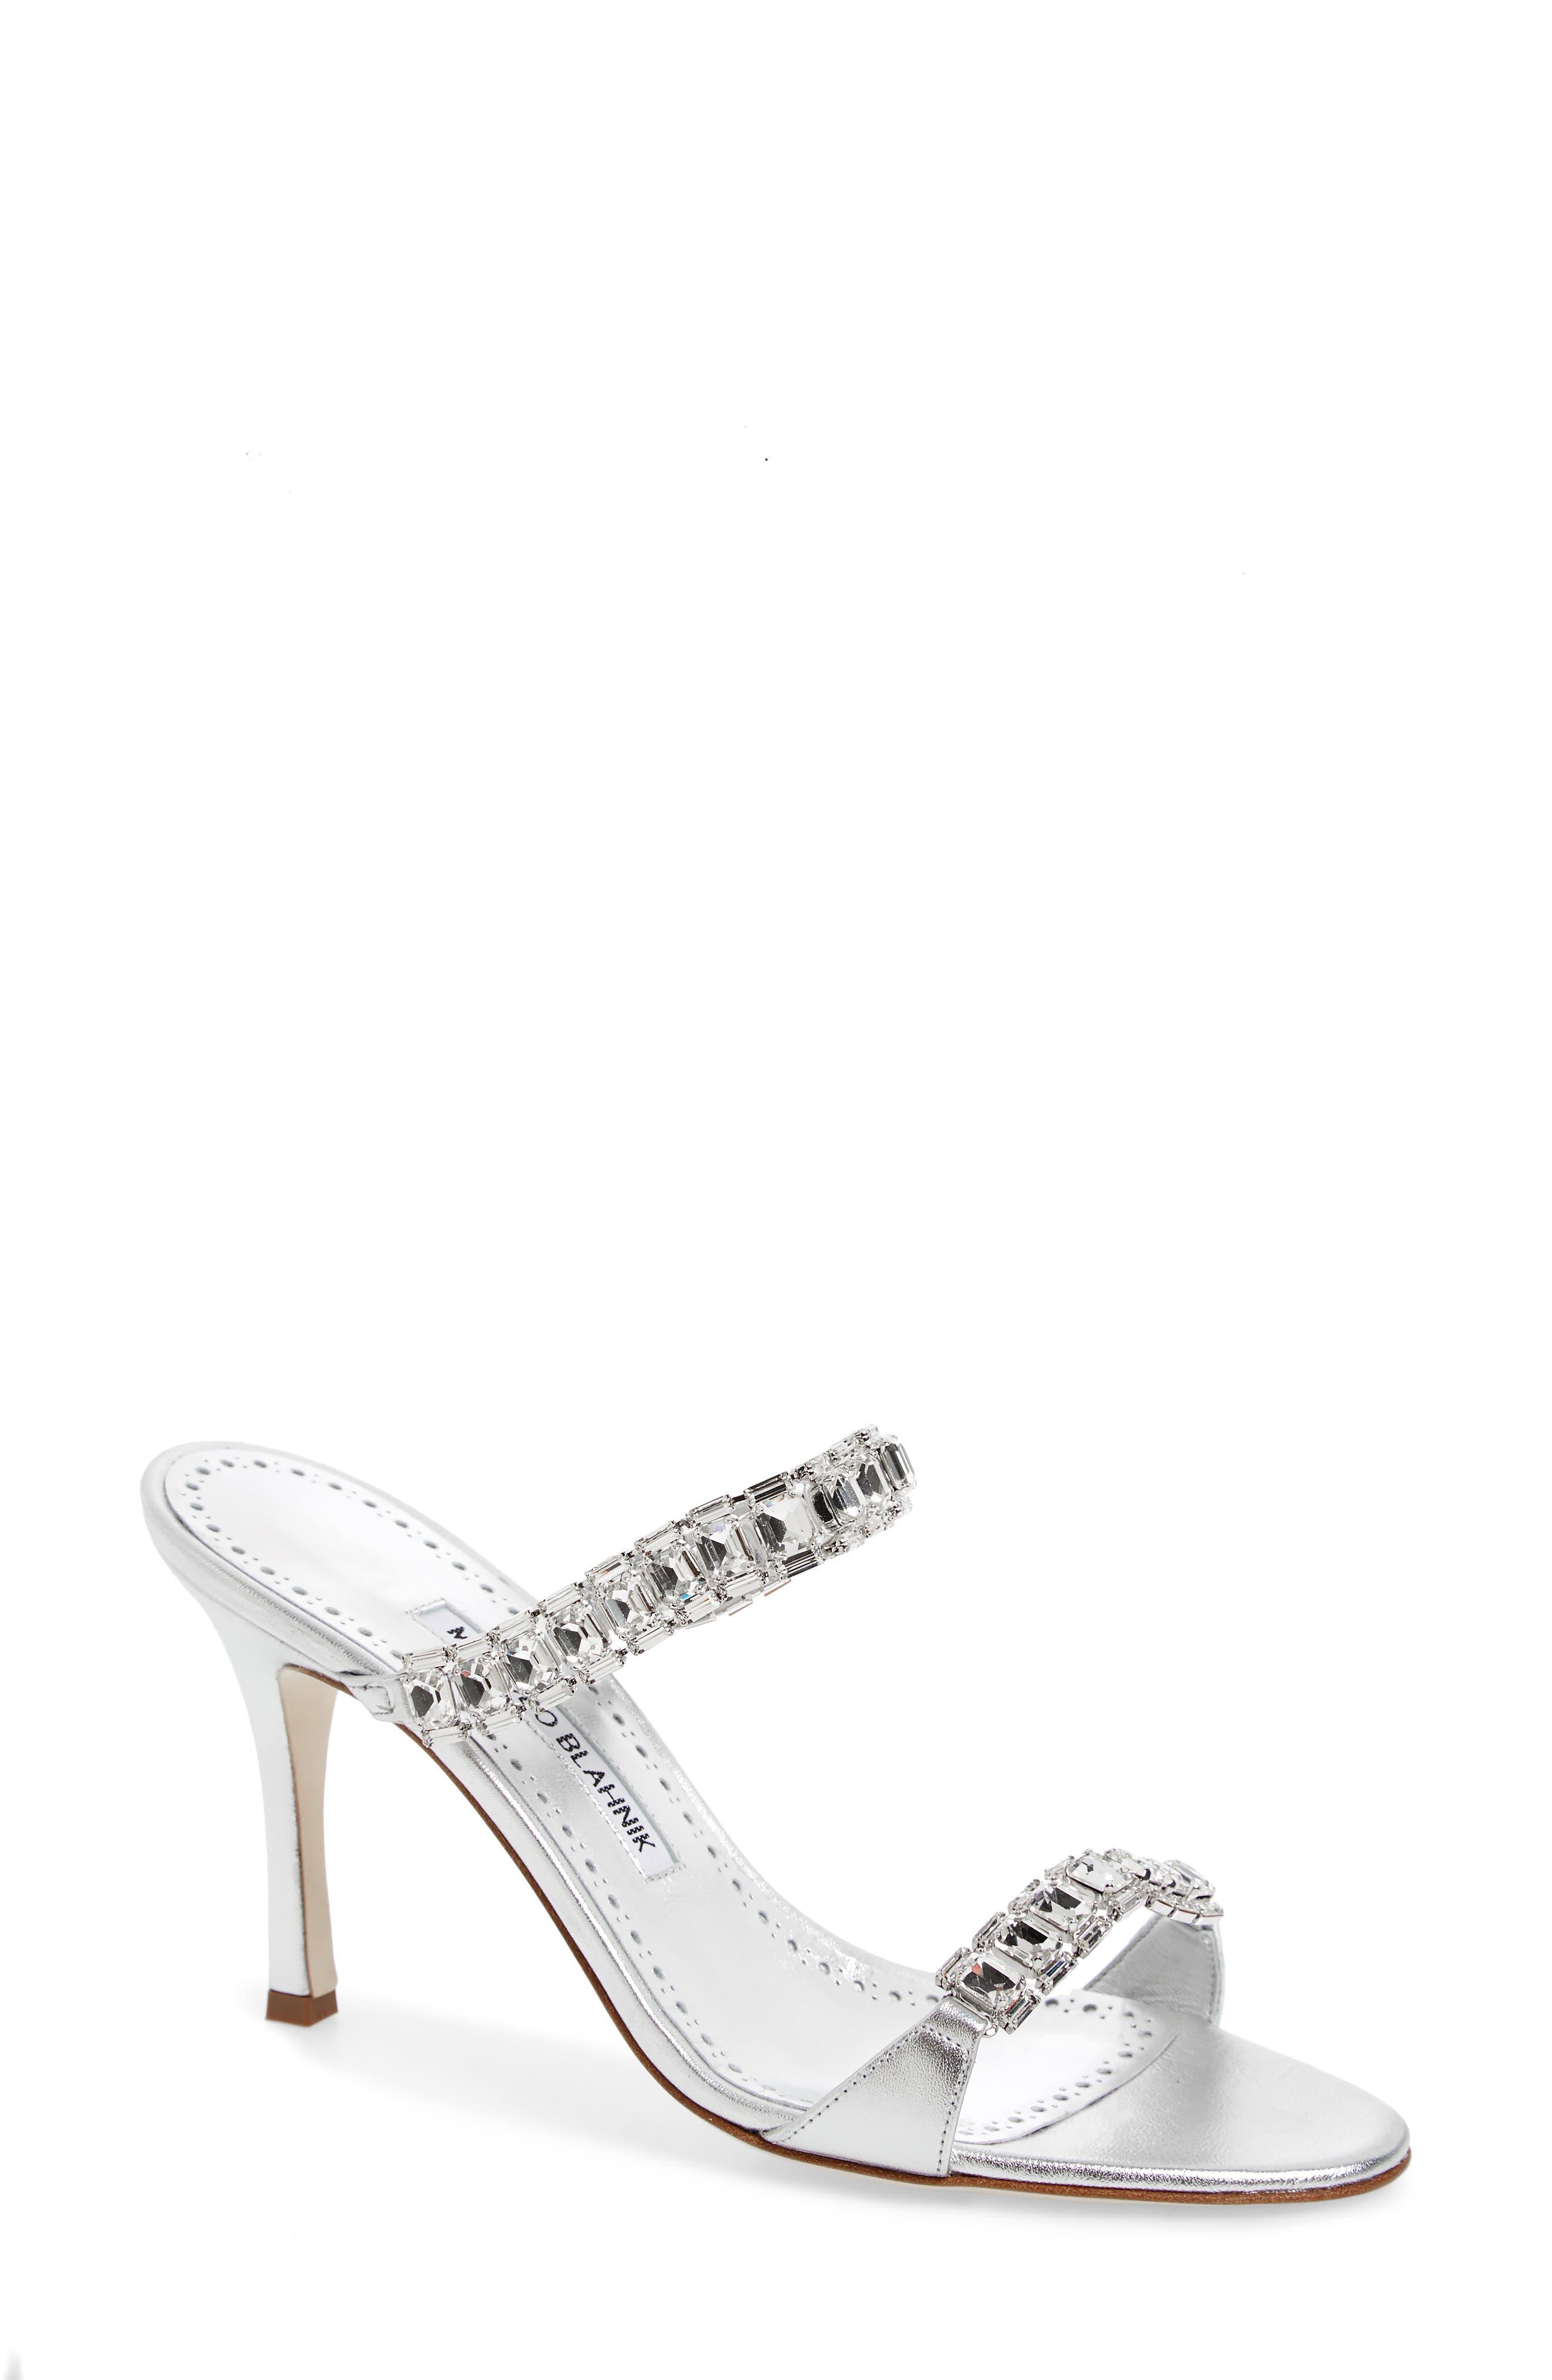 Dallifac Embellished Sandal,                         Main,                         color, Silver